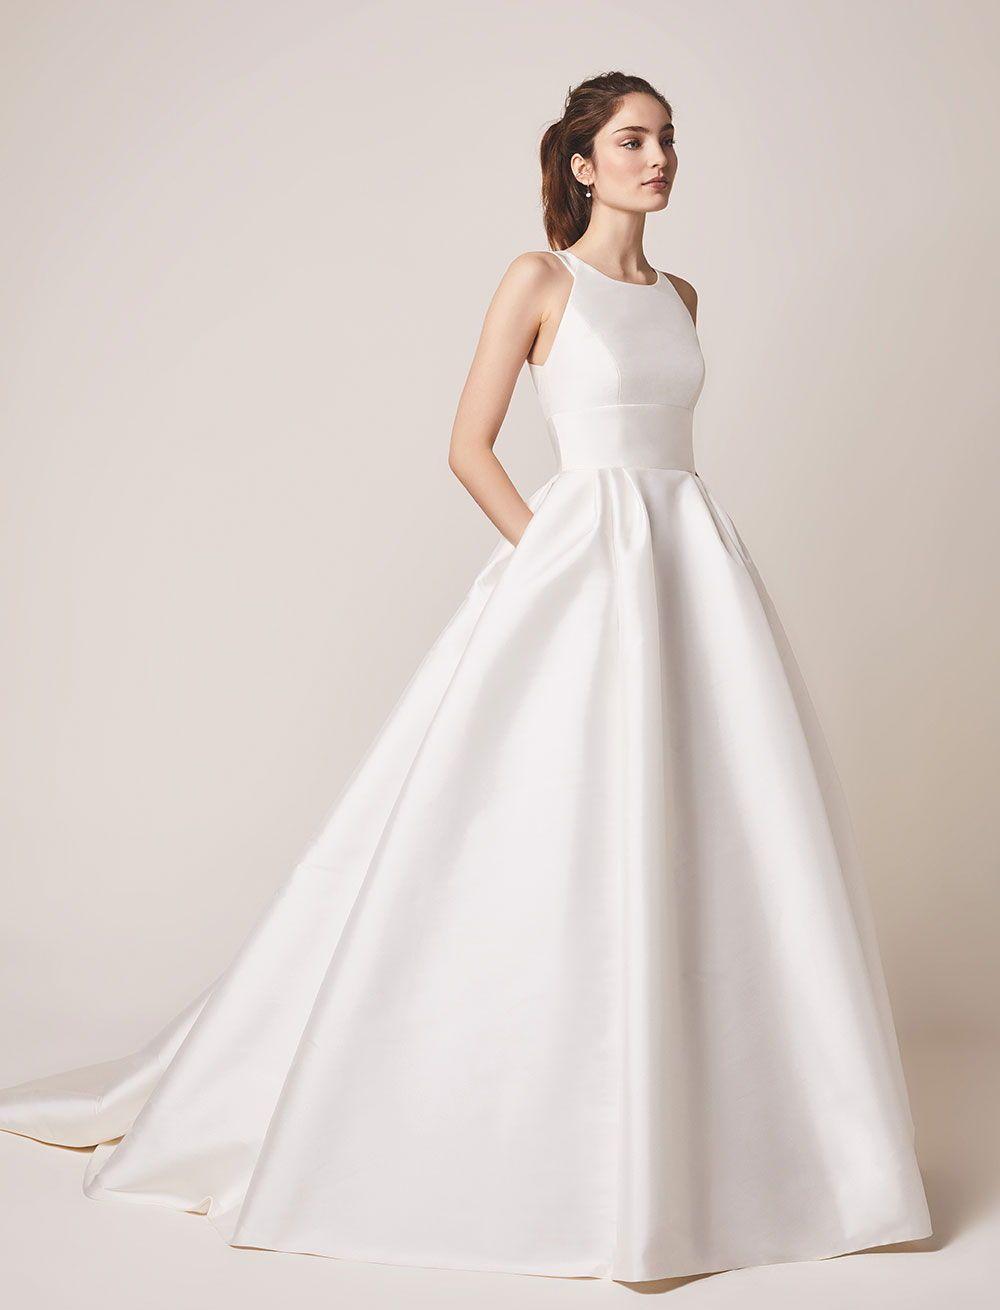 Ball Gown V Neck Satin Sweep Train Pockets Wedding Dresses Wedding Dresses Pronovias Wedding Dress Ruffle Wedding Dress